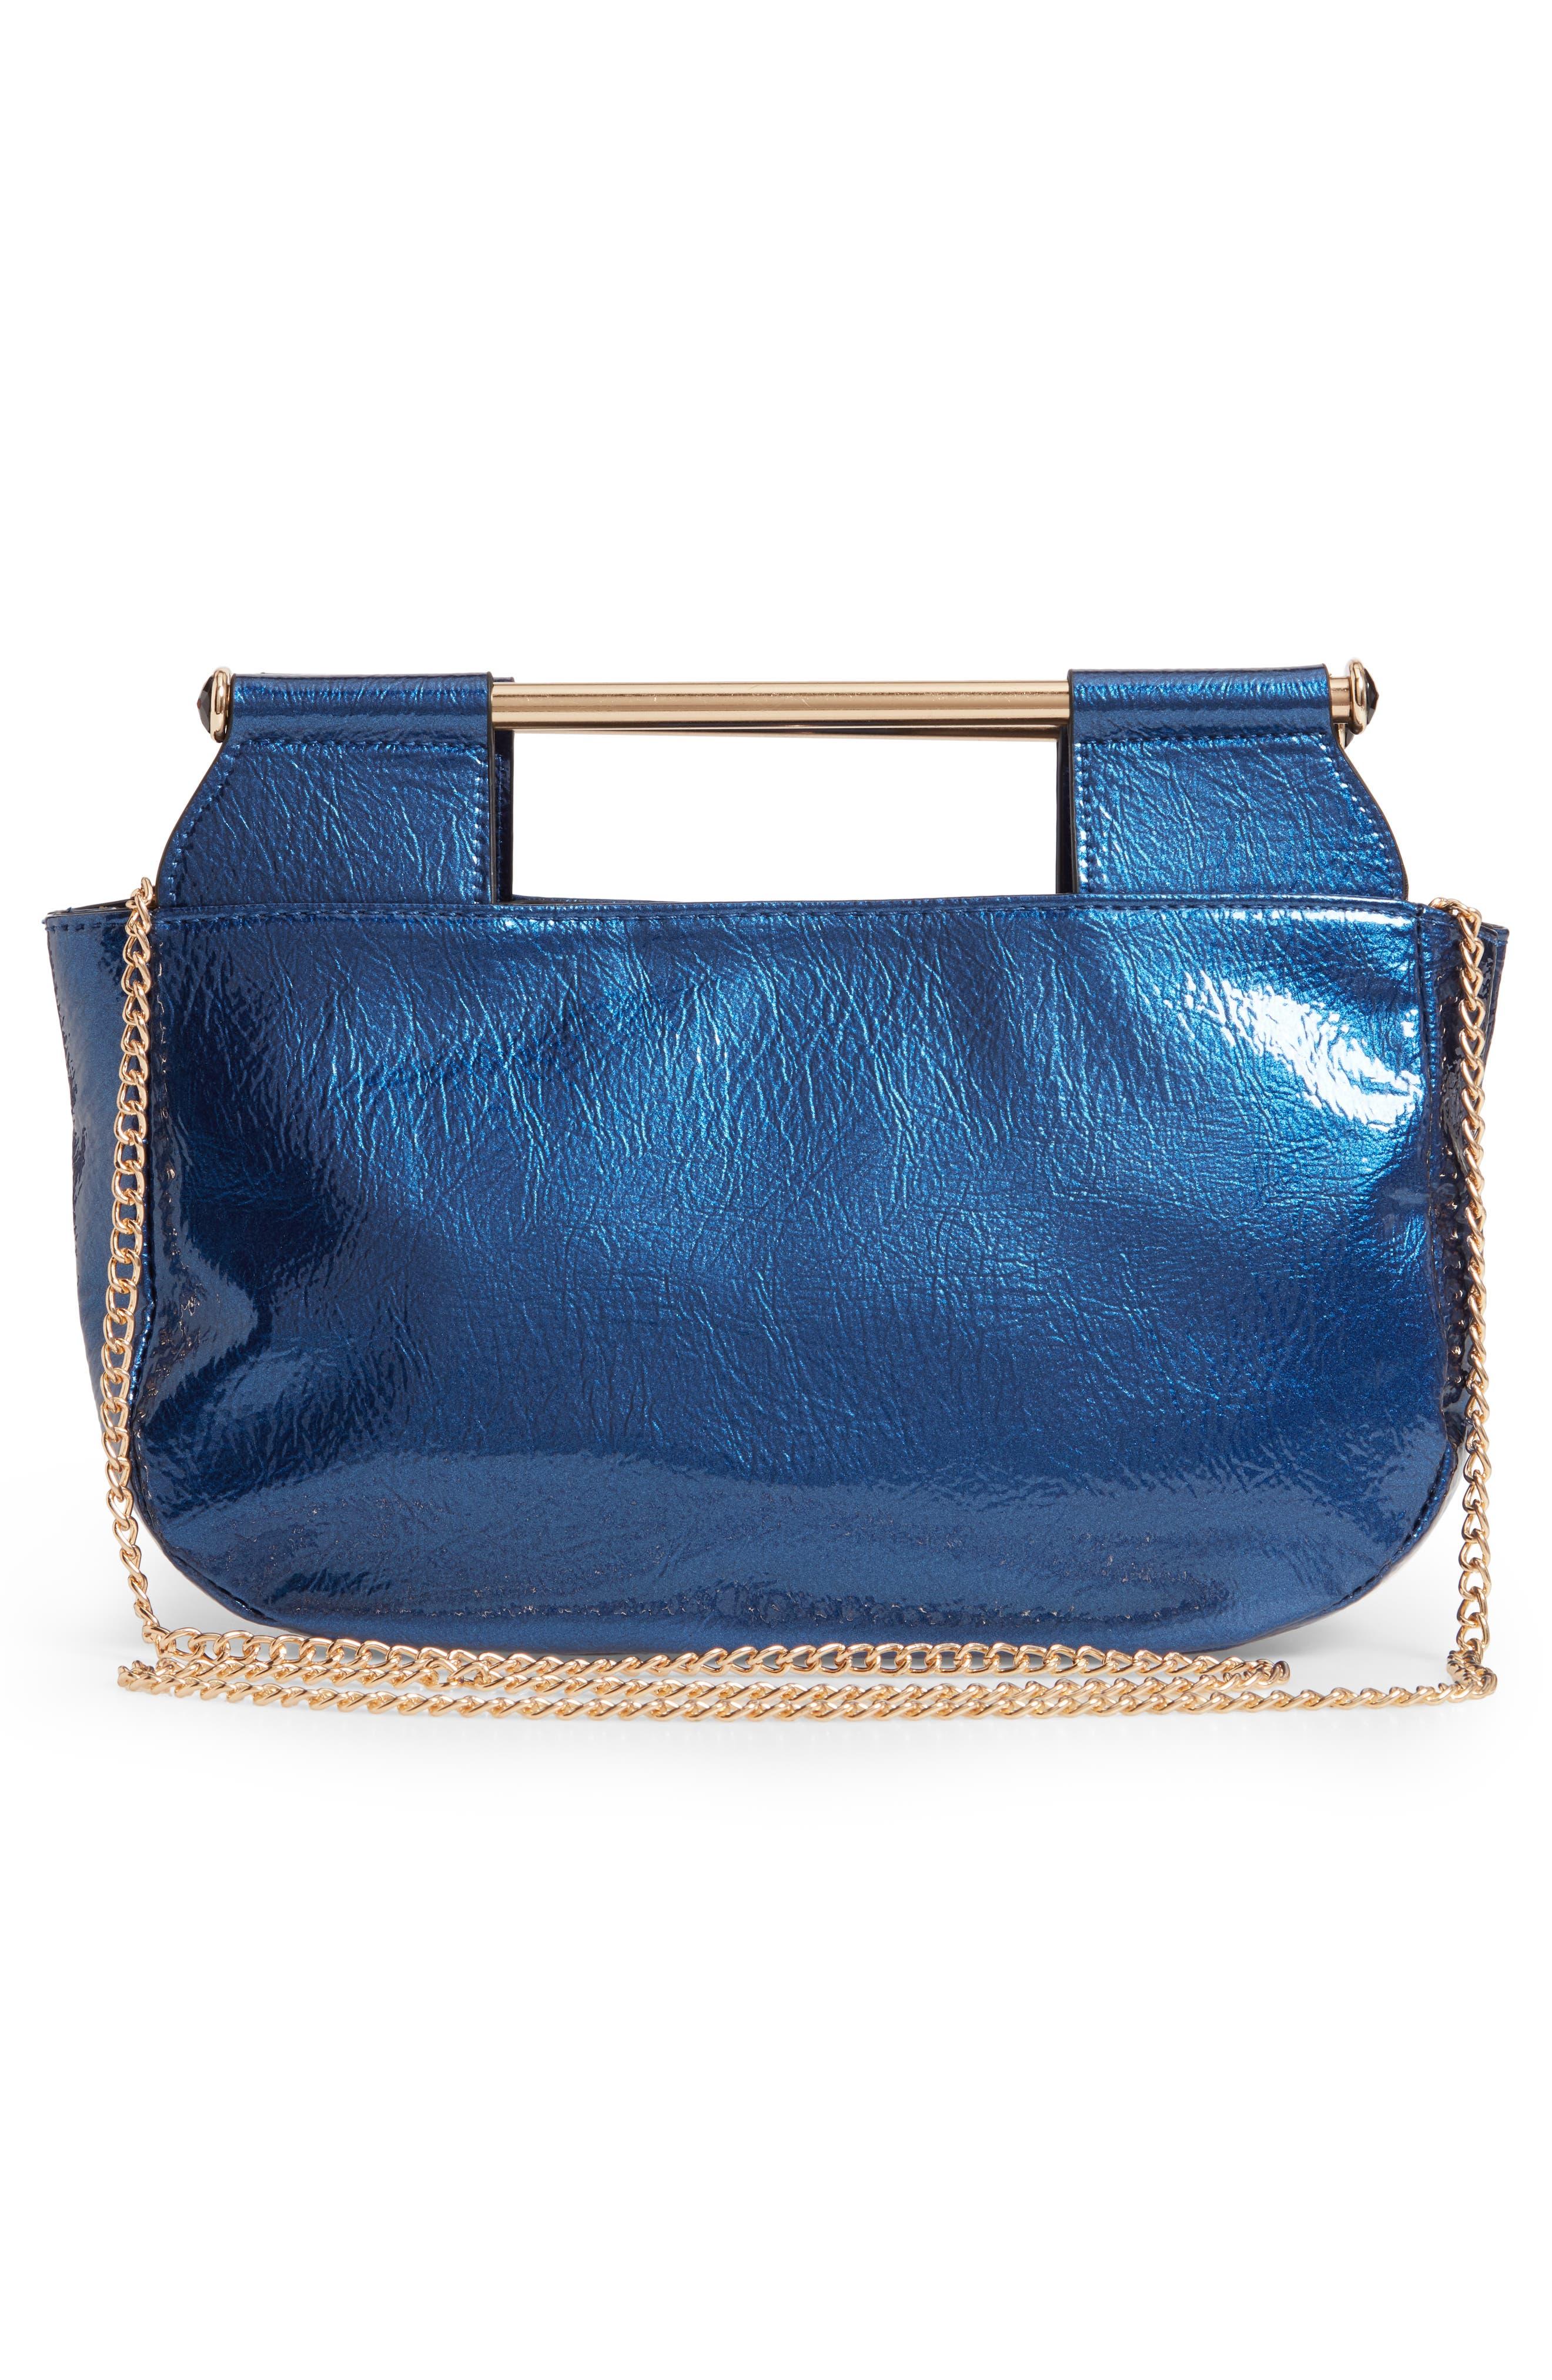 Patent Leather Crossbody Bag,                             Alternate thumbnail 3, color,                             400